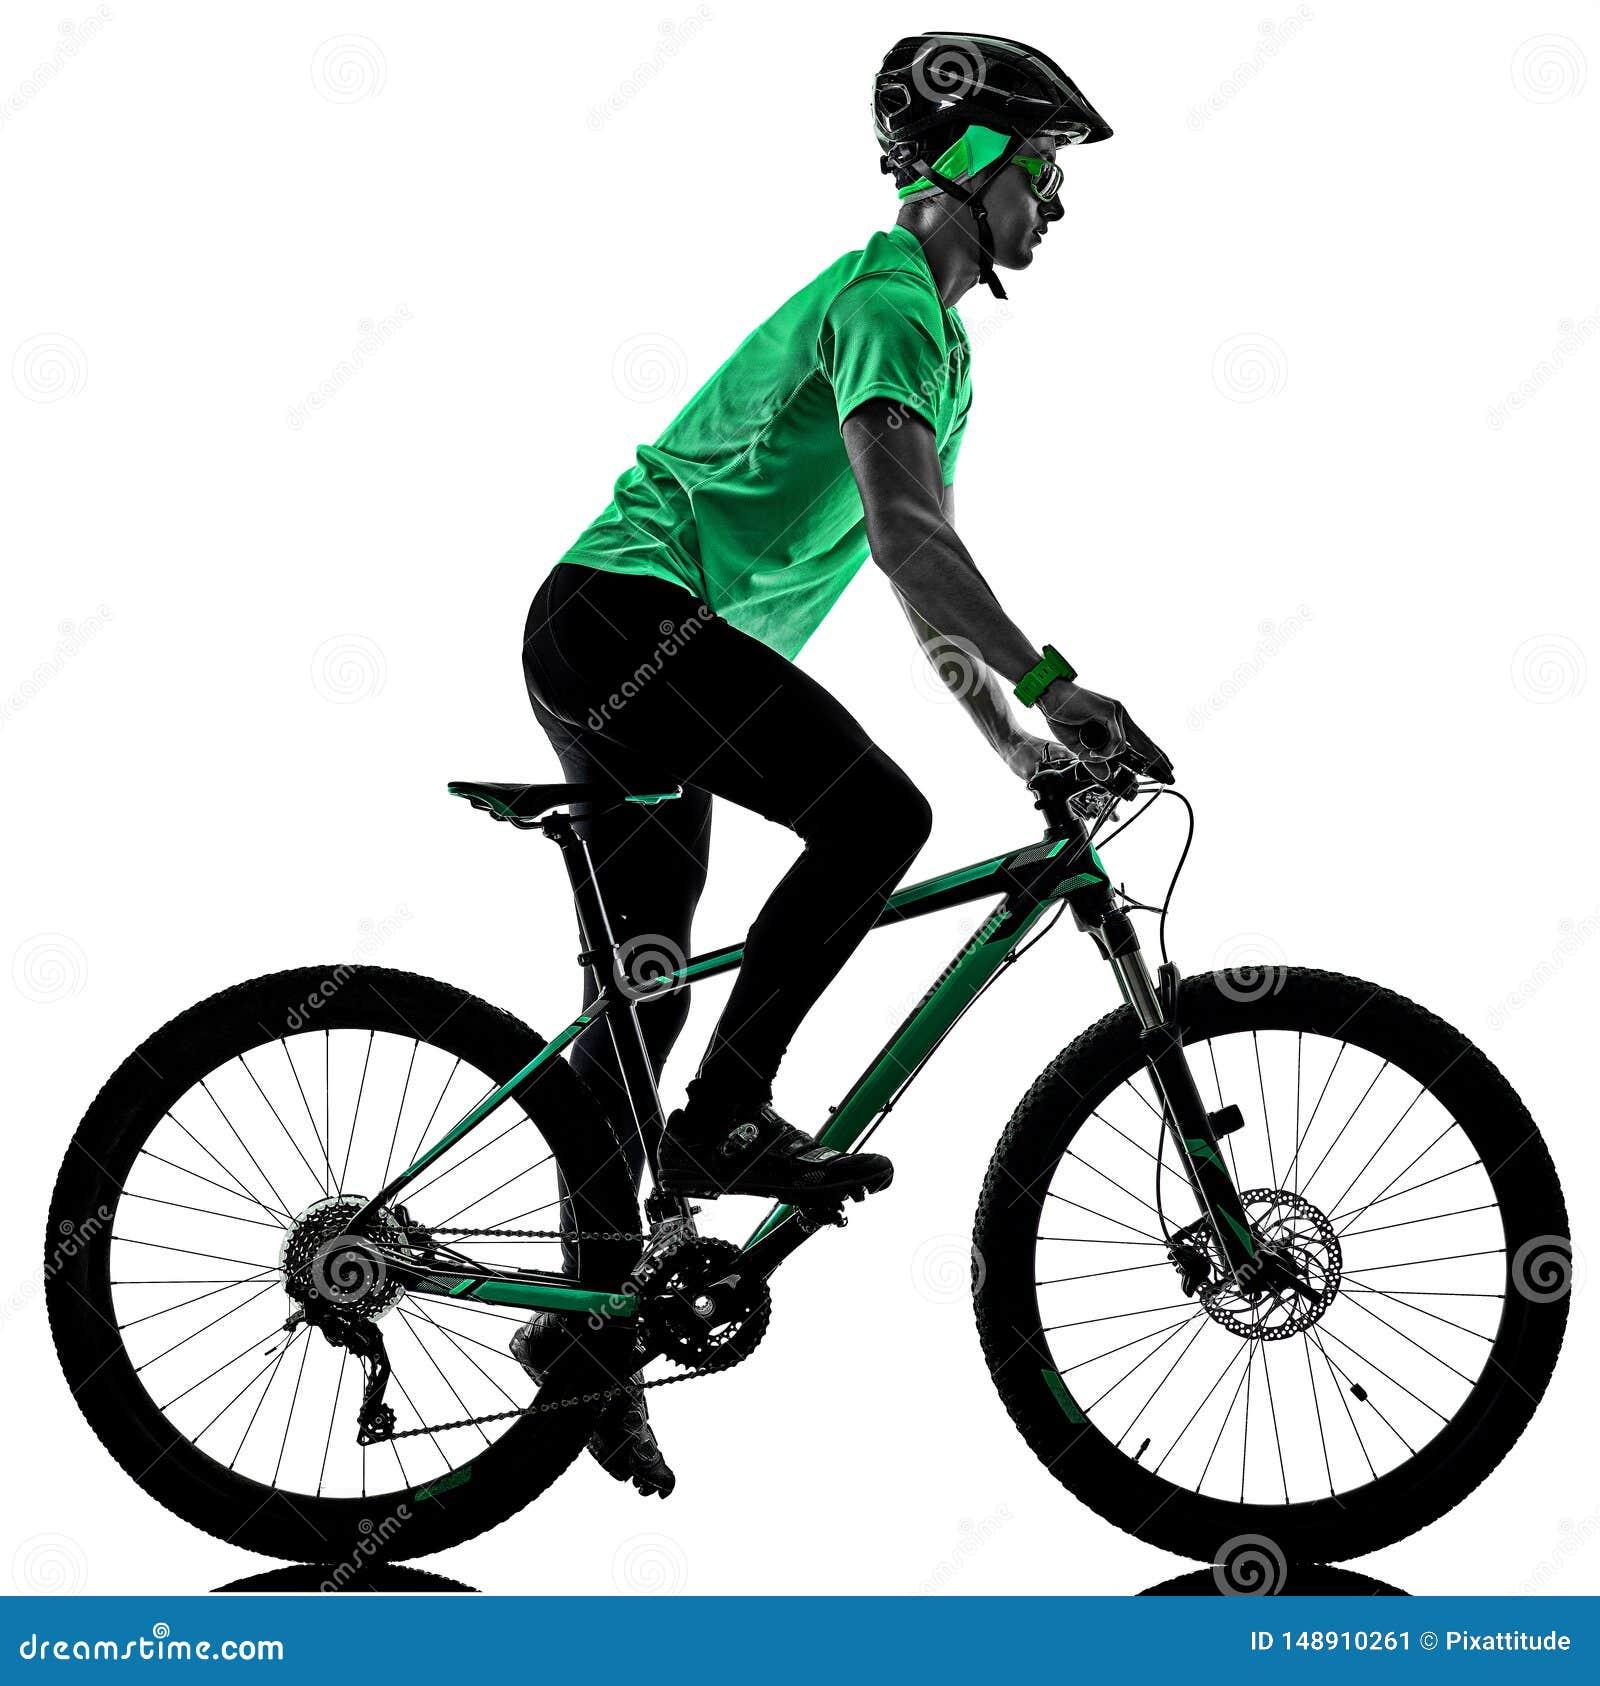 Tenager ch?opiec roweru g?rskiego bking cienie